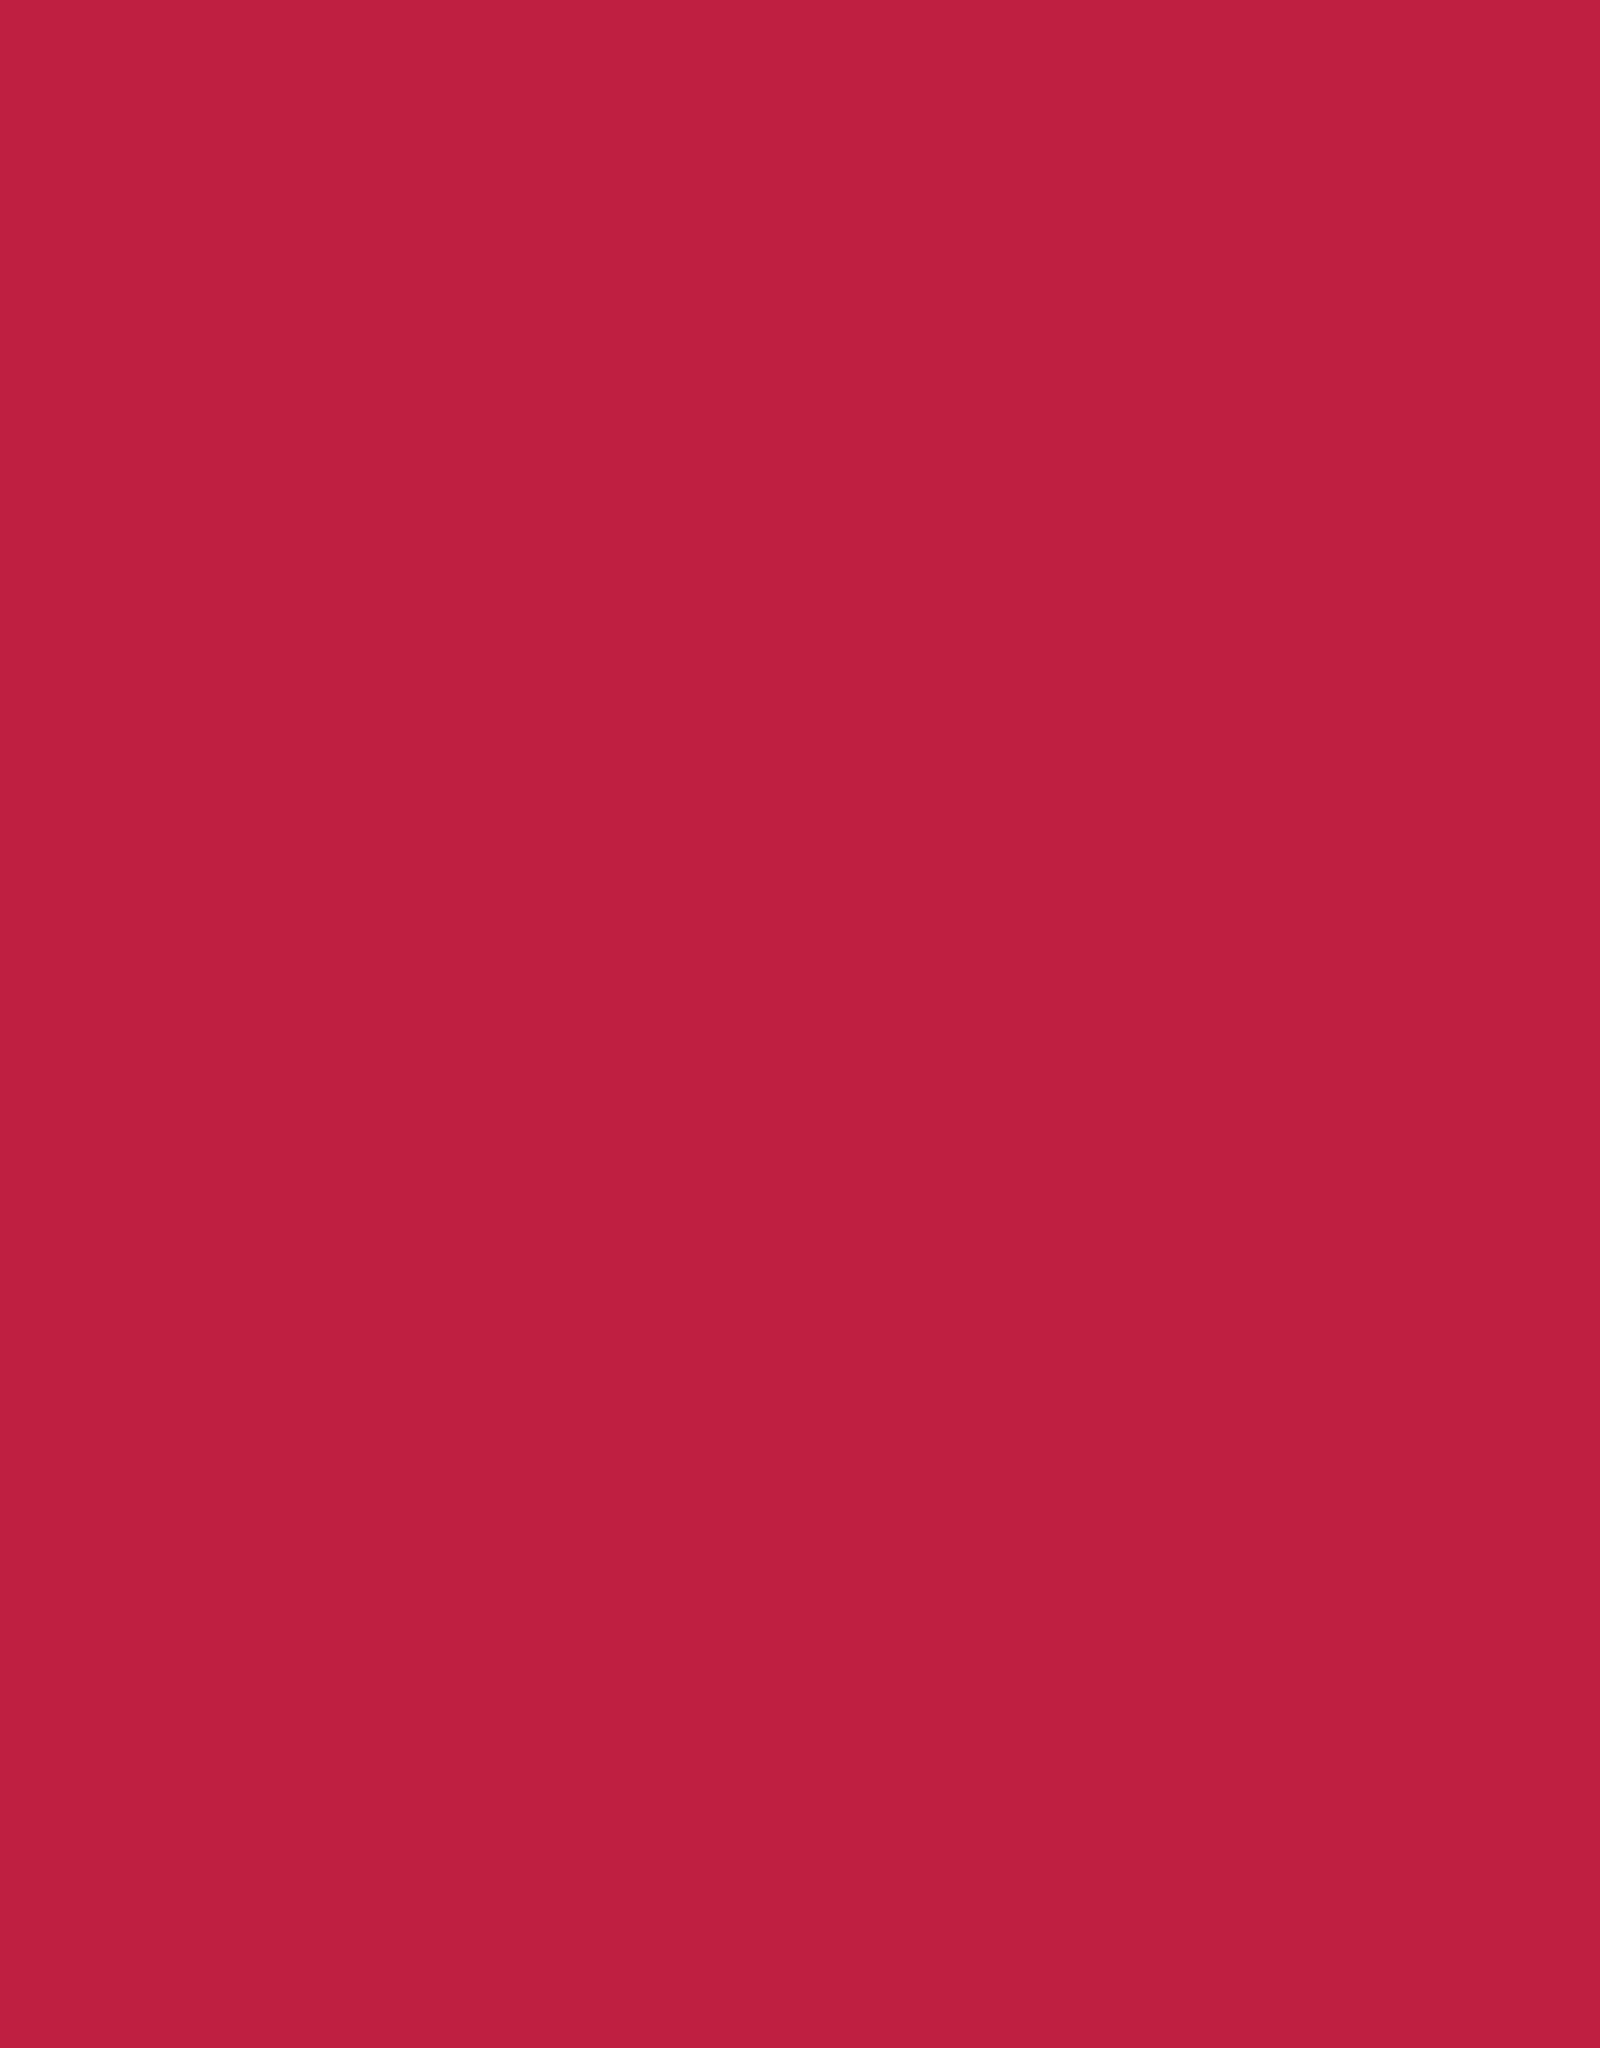 Jacquard Solarfast Red Large